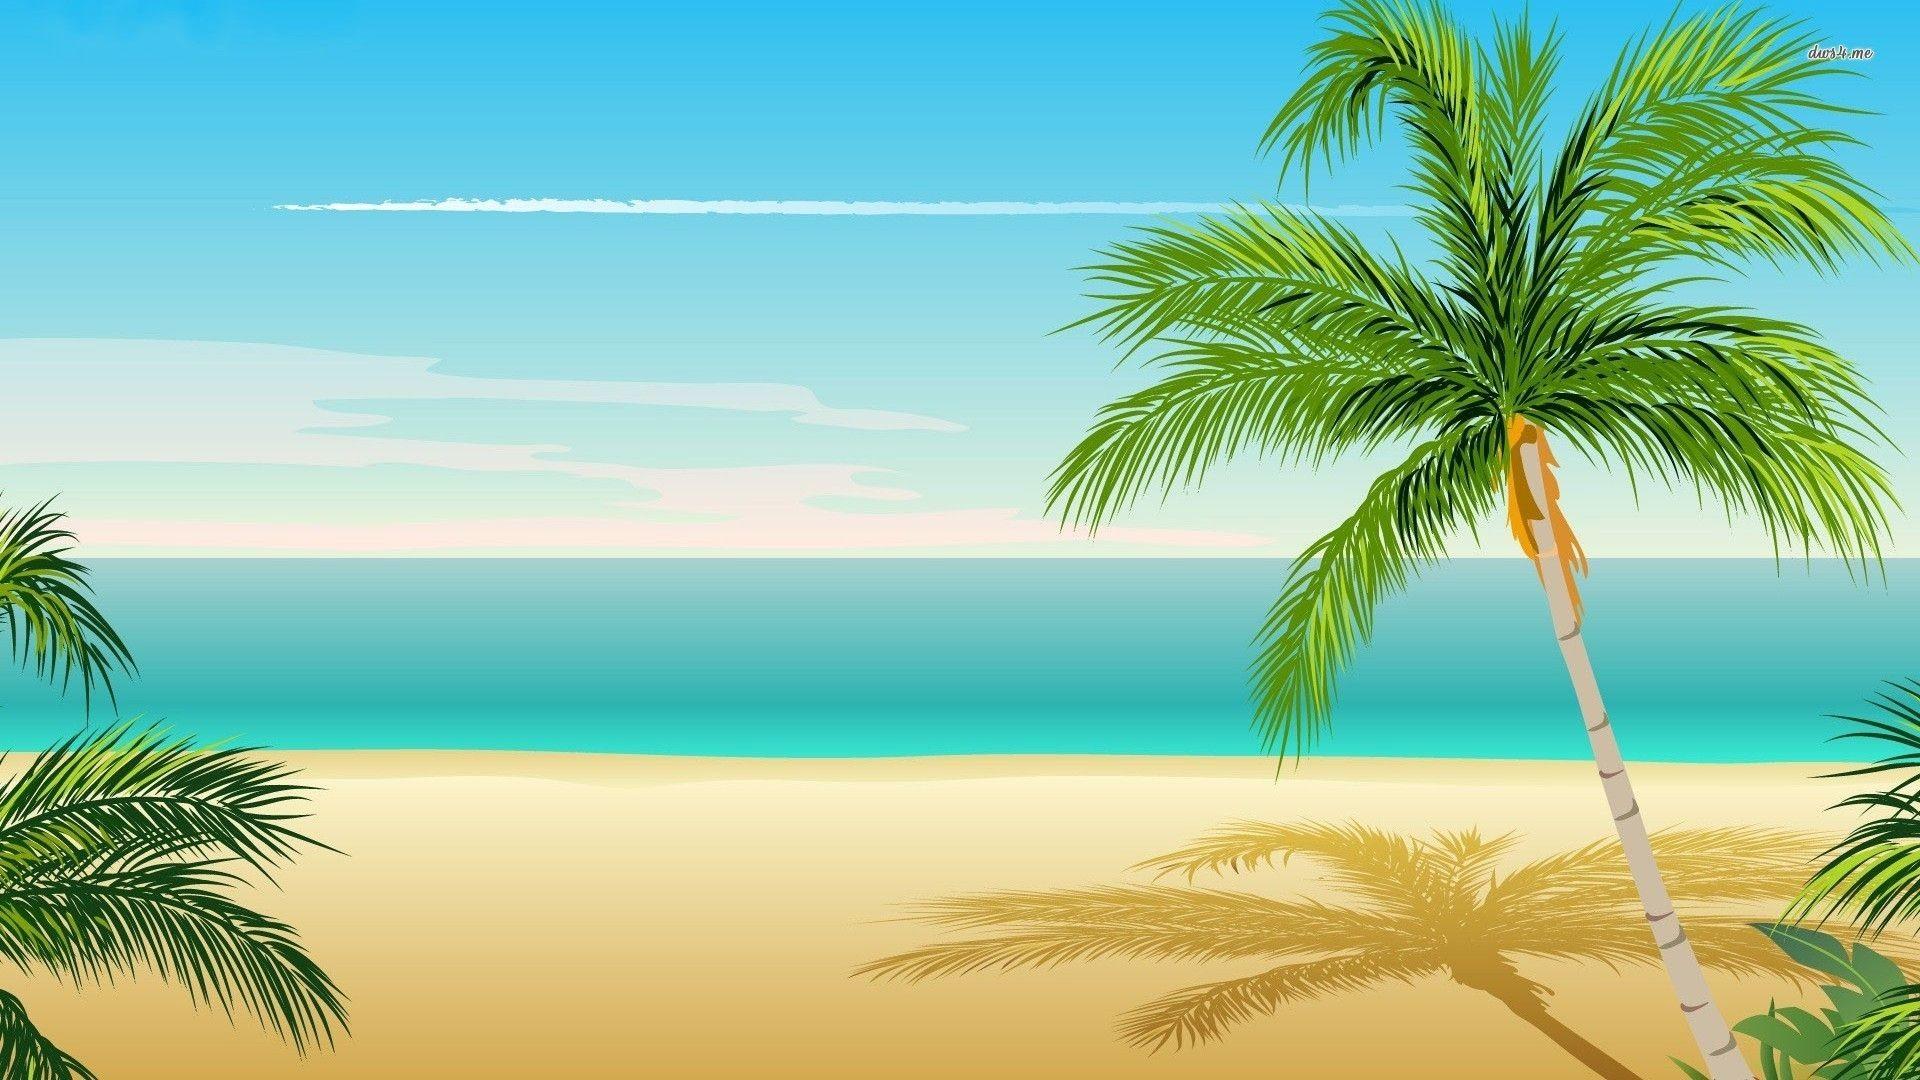 1920x1080, Palm Tree Top Hd Desktop Wallpaper - Cartoon Palm Tree Background - HD Wallpaper